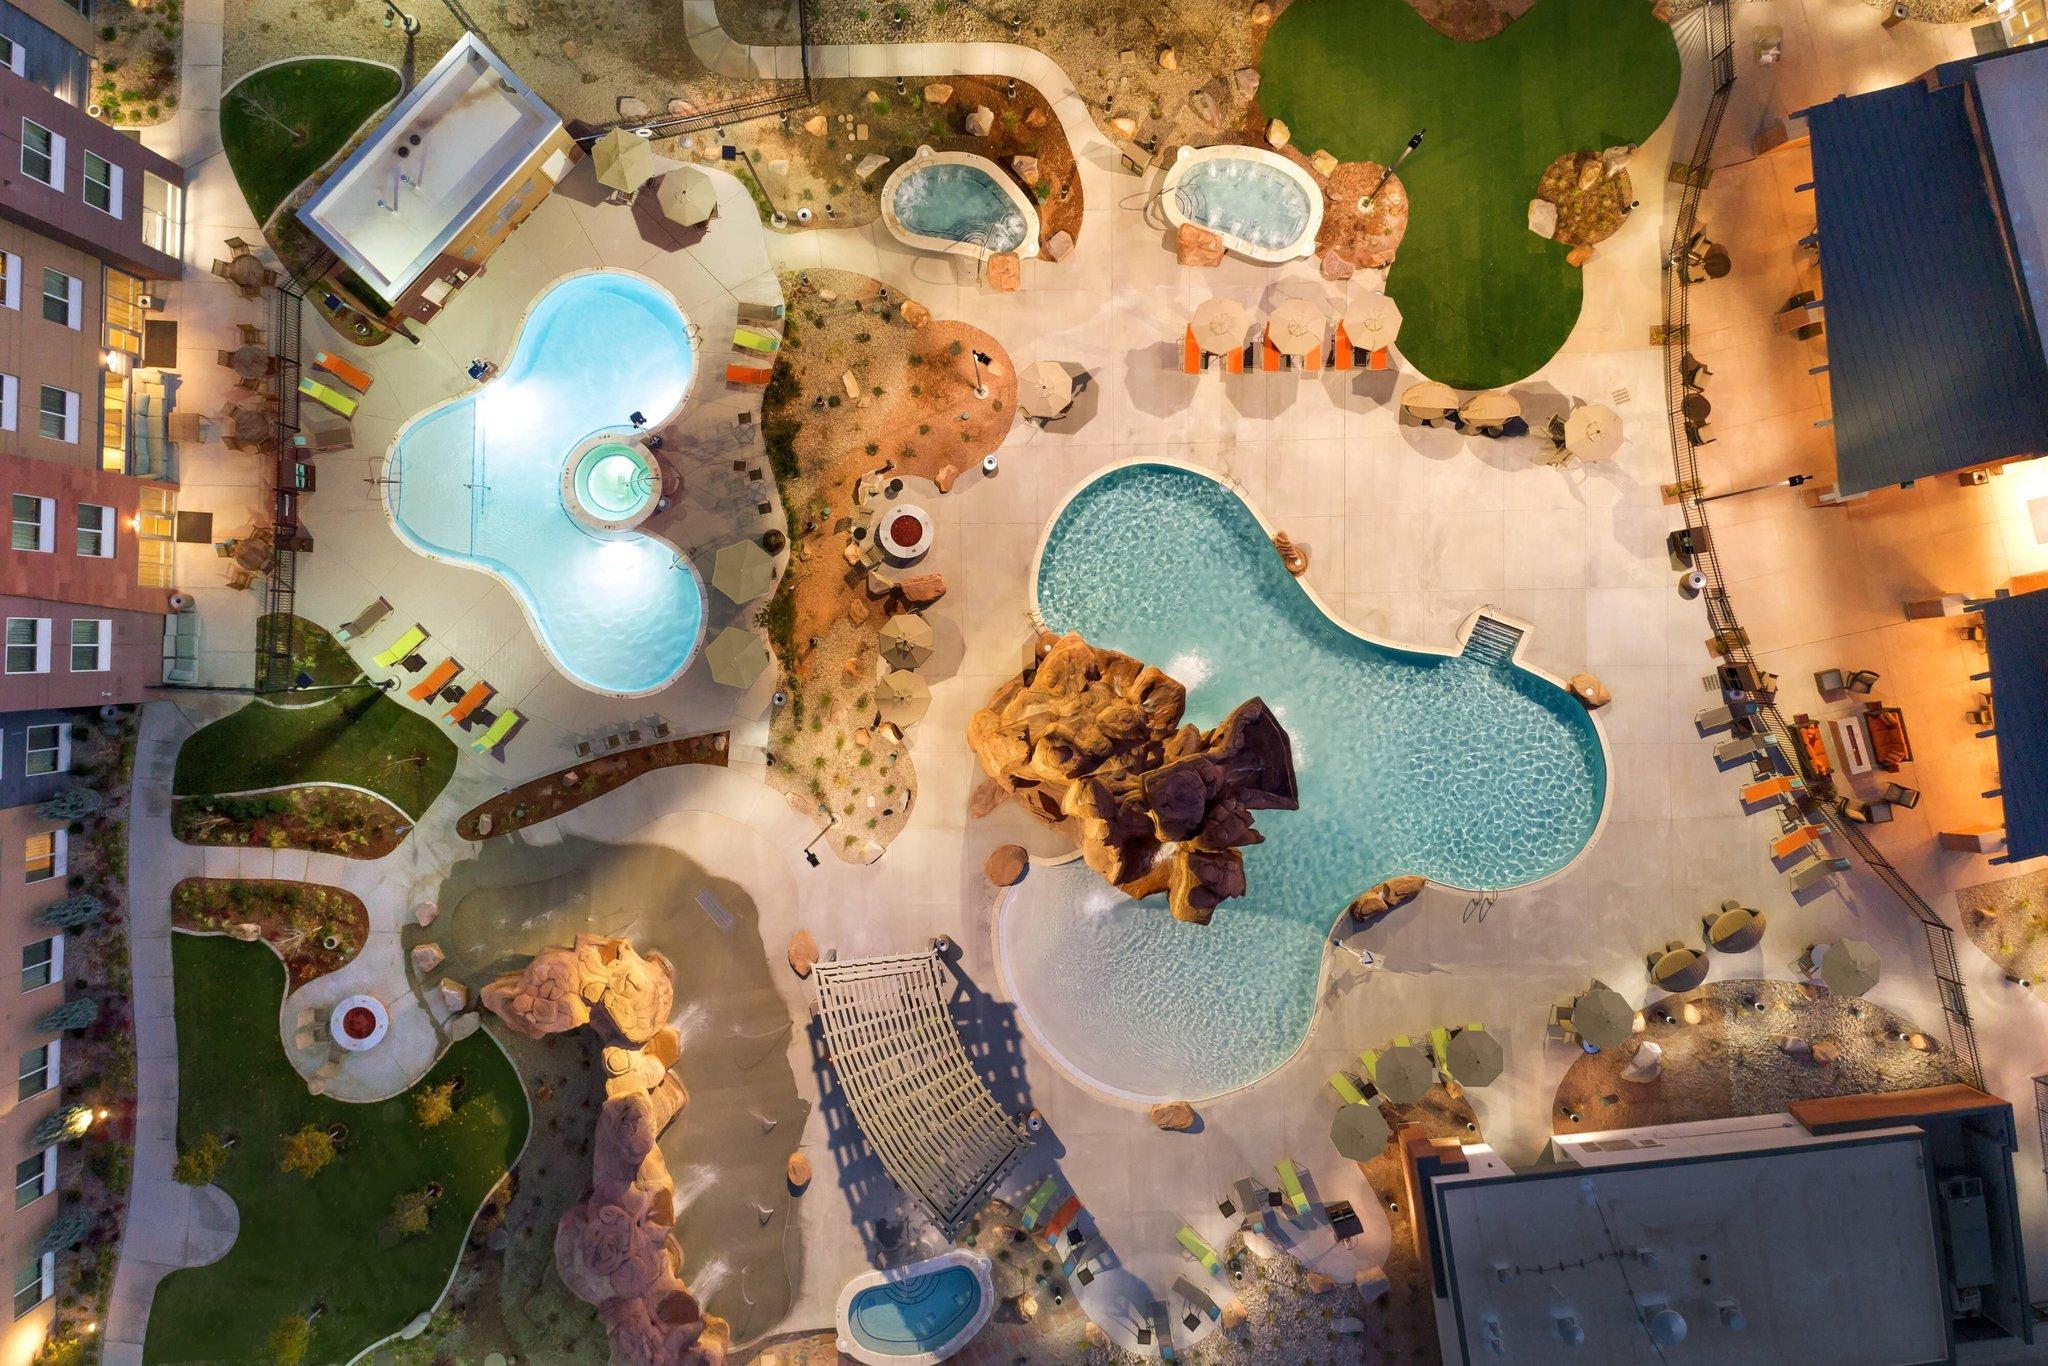 Fairfield Inn and Suites by Marriott Moab